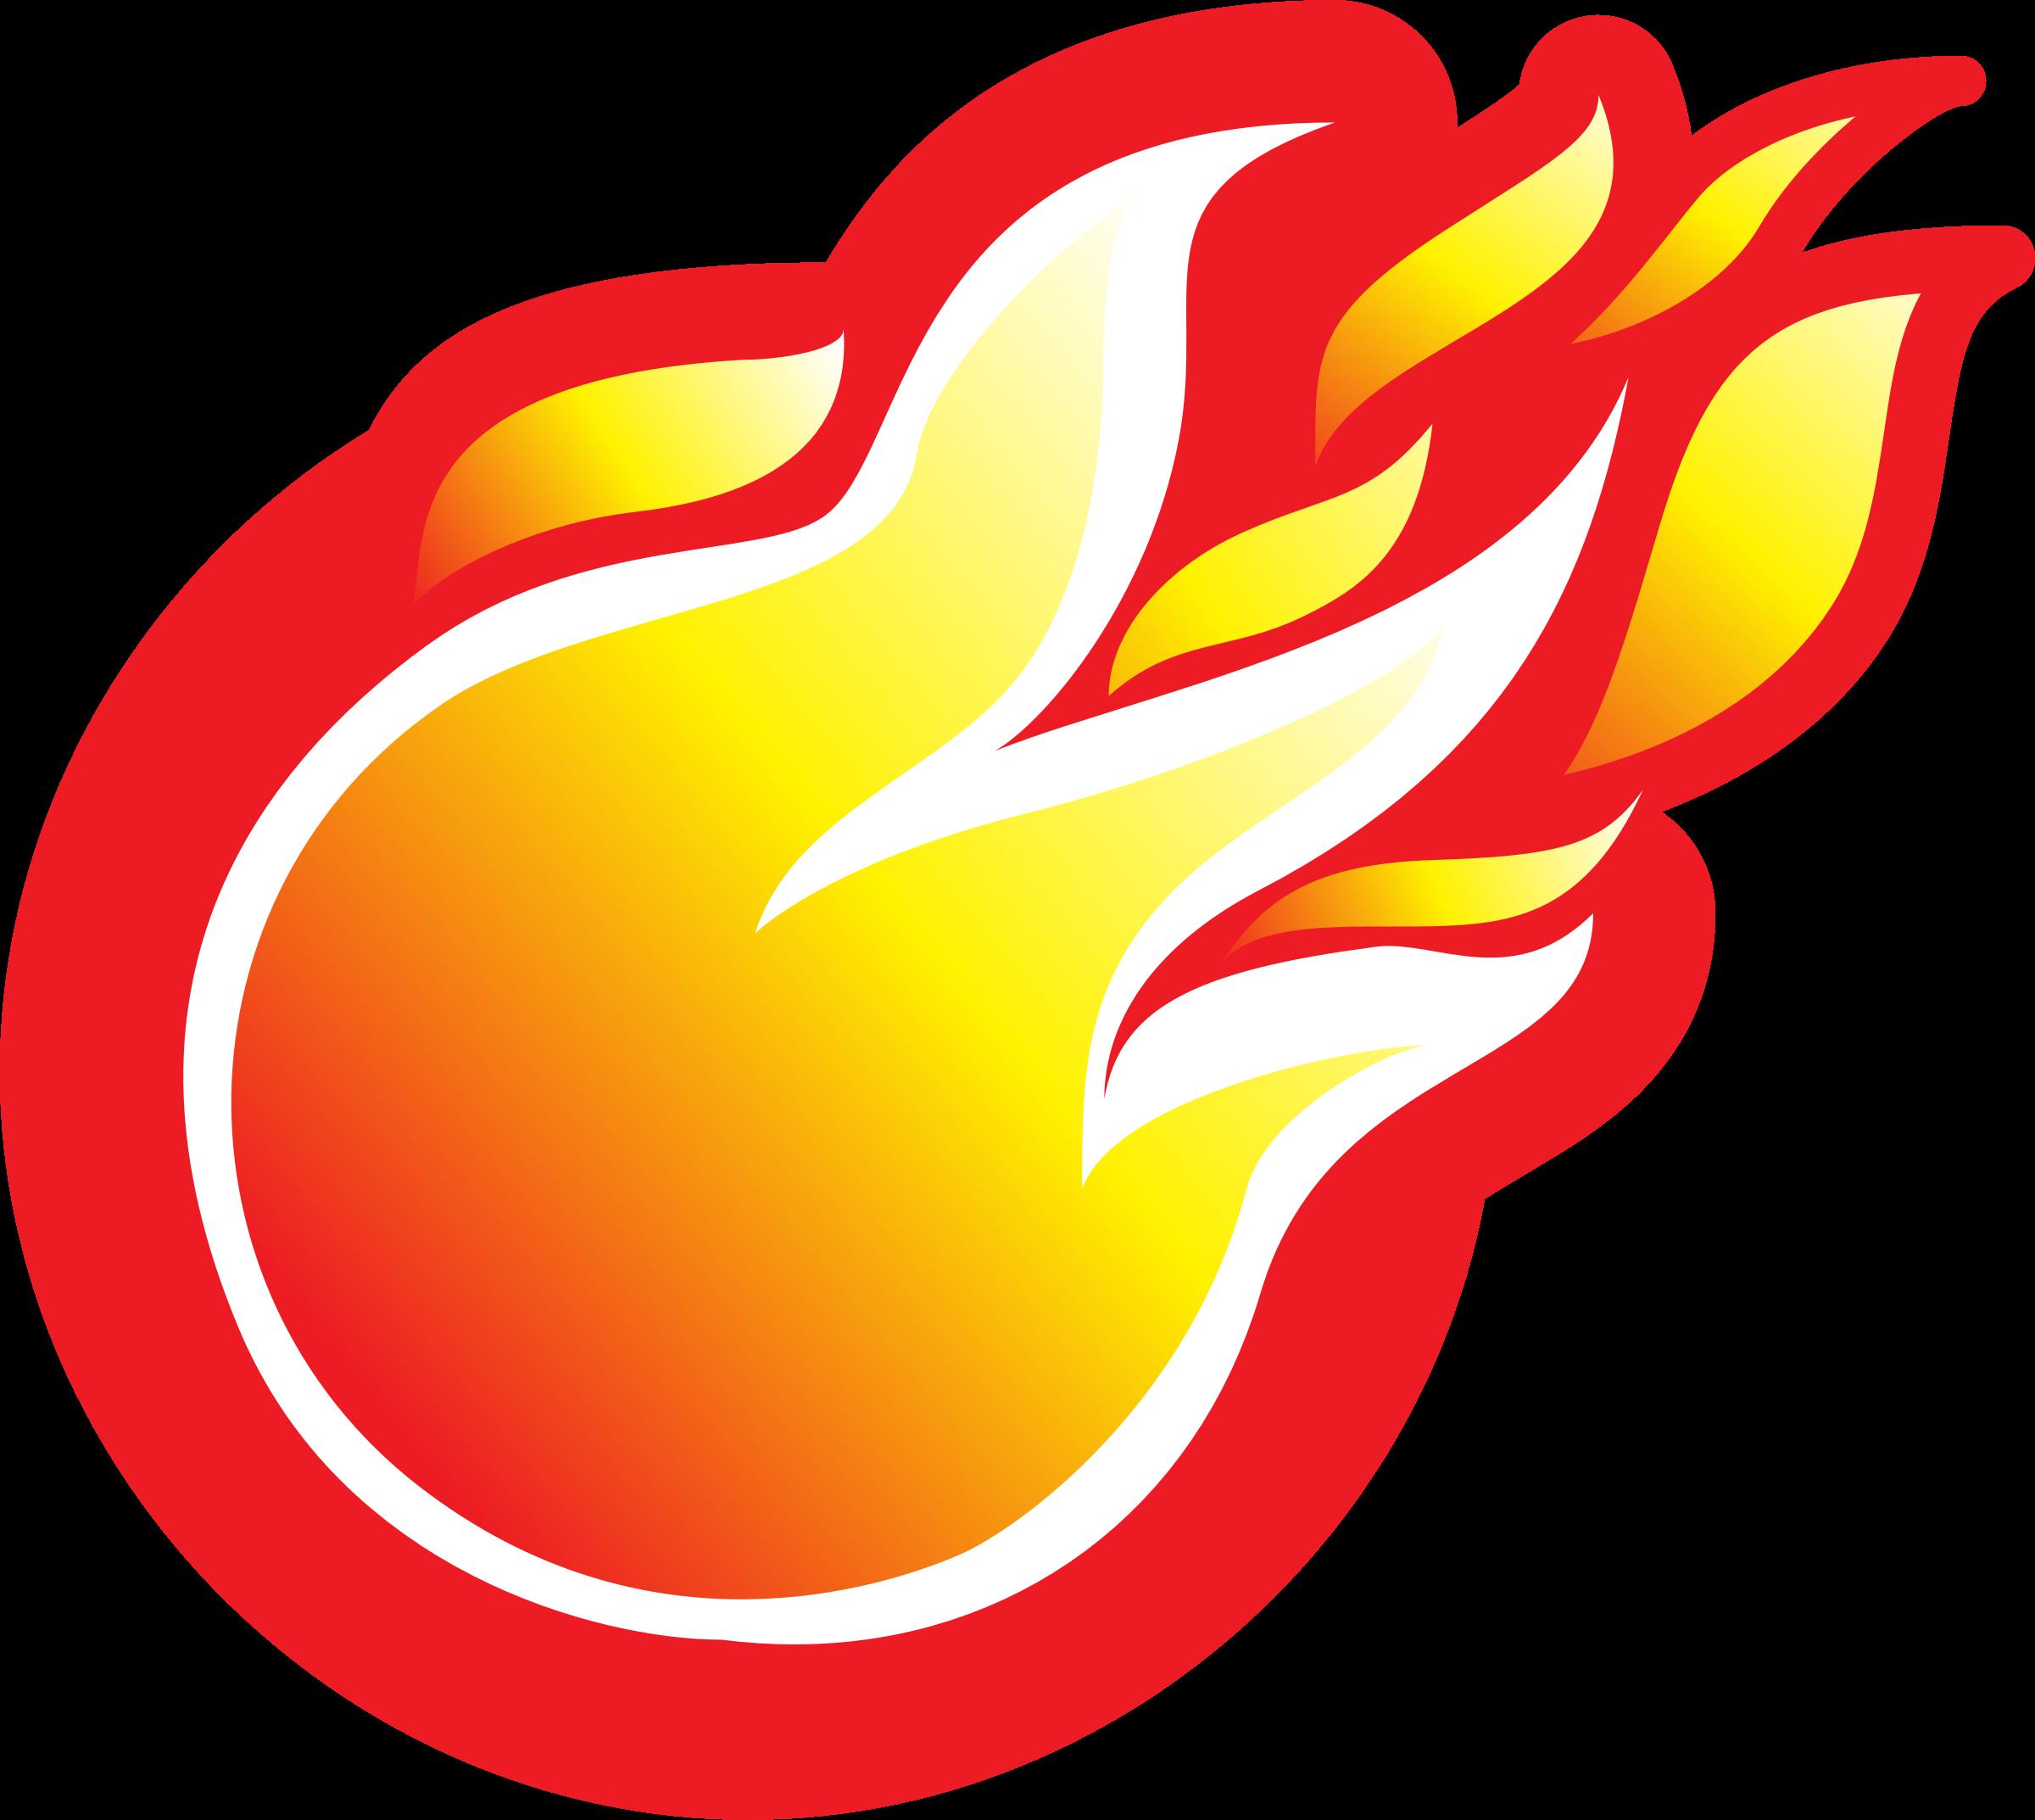 Clip Art Flame Clipart flame clipart cli-Clip Art Flame Clipart flame clipart clipartall flames clip art vector-6